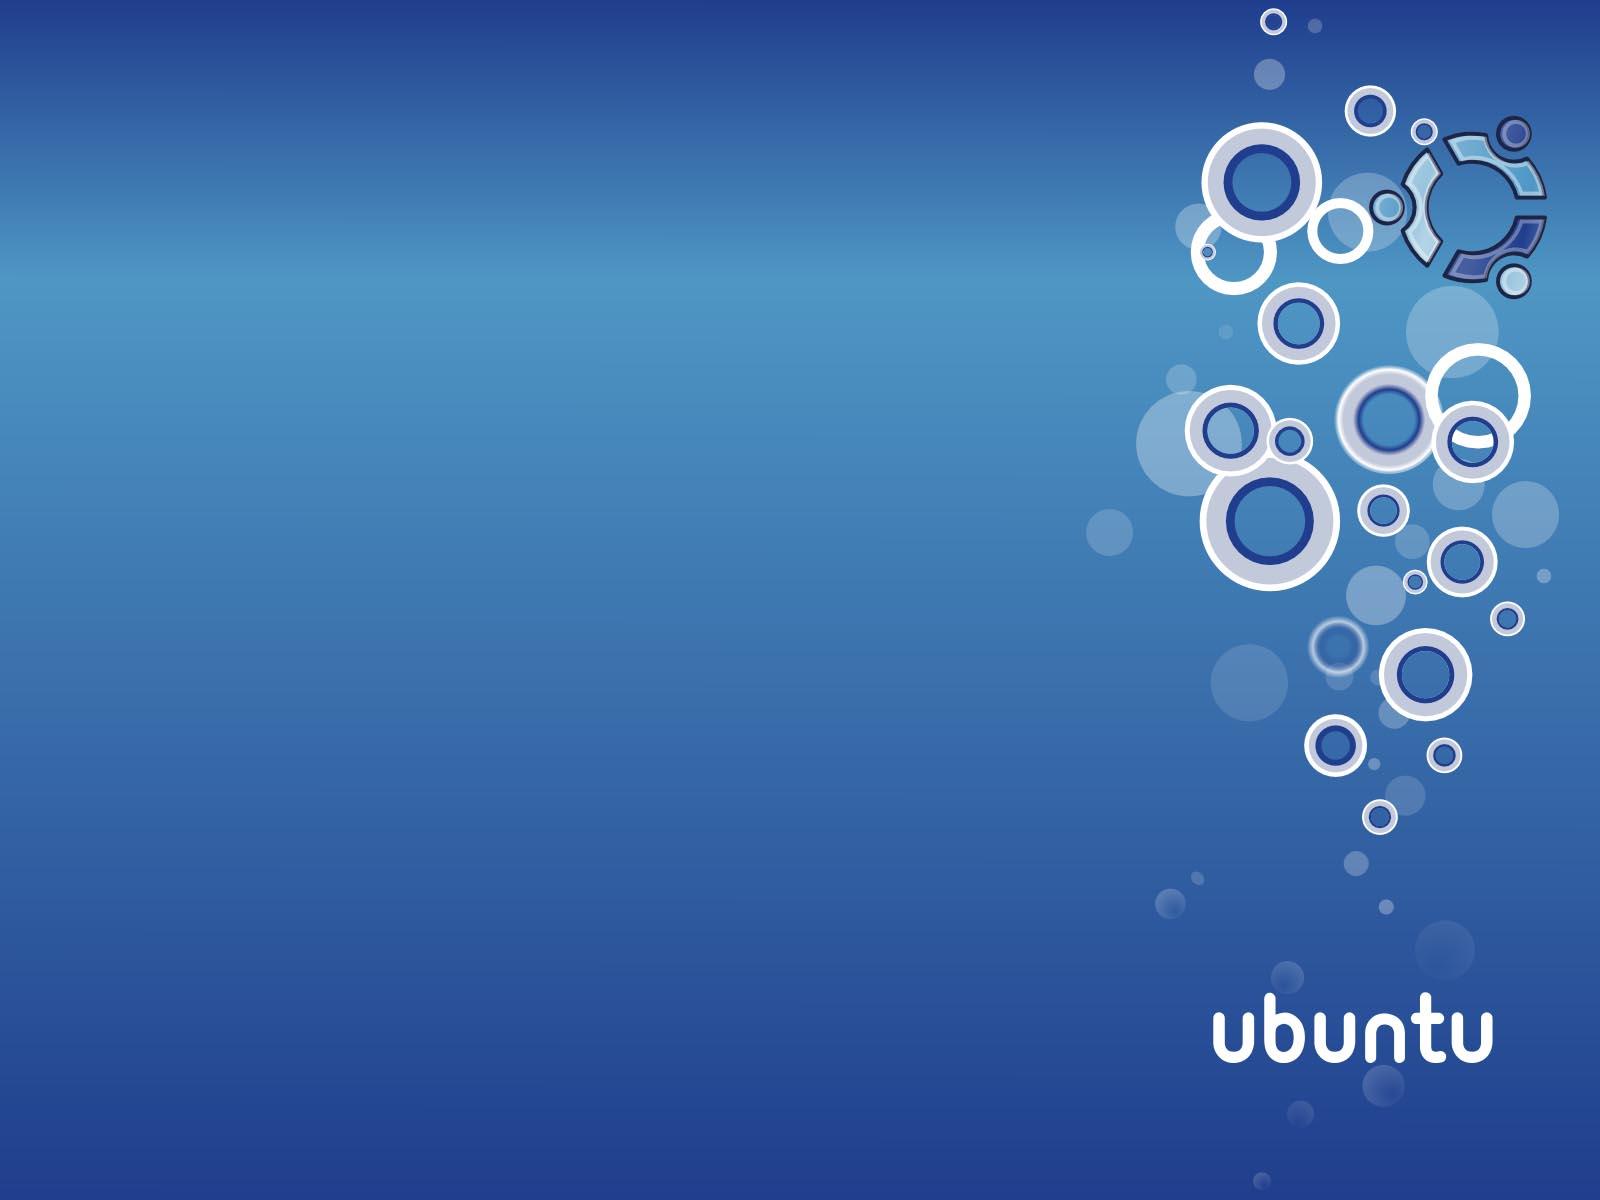 ubuntu desktop wallpaper   wwwhigh definition wallpapercom 1600x1200